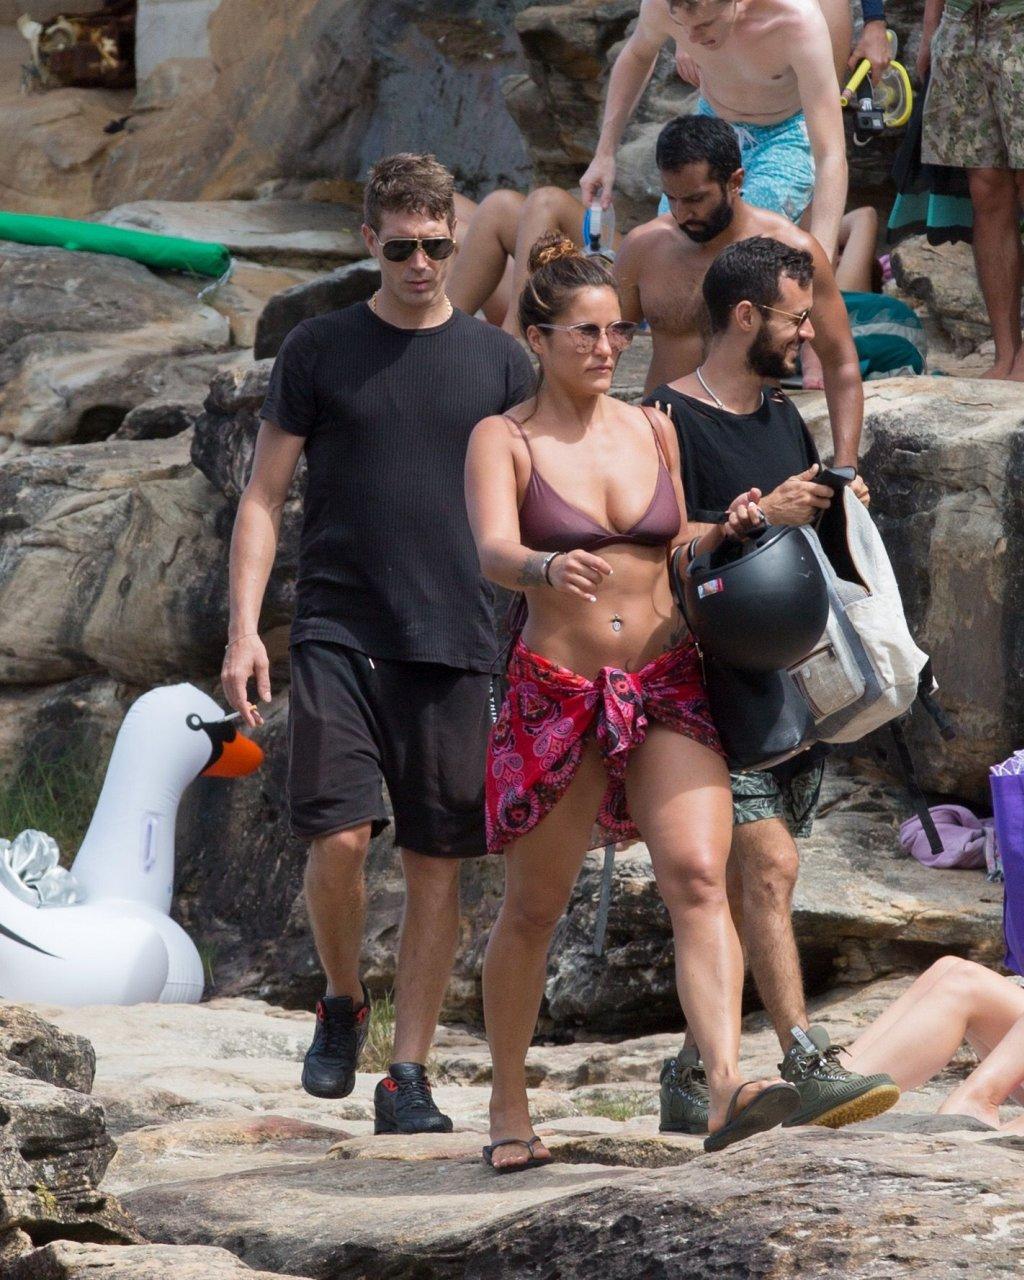 Sexy Elora Tahiti nudes (47 photo), Tits, Leaked, Feet, bra 2019